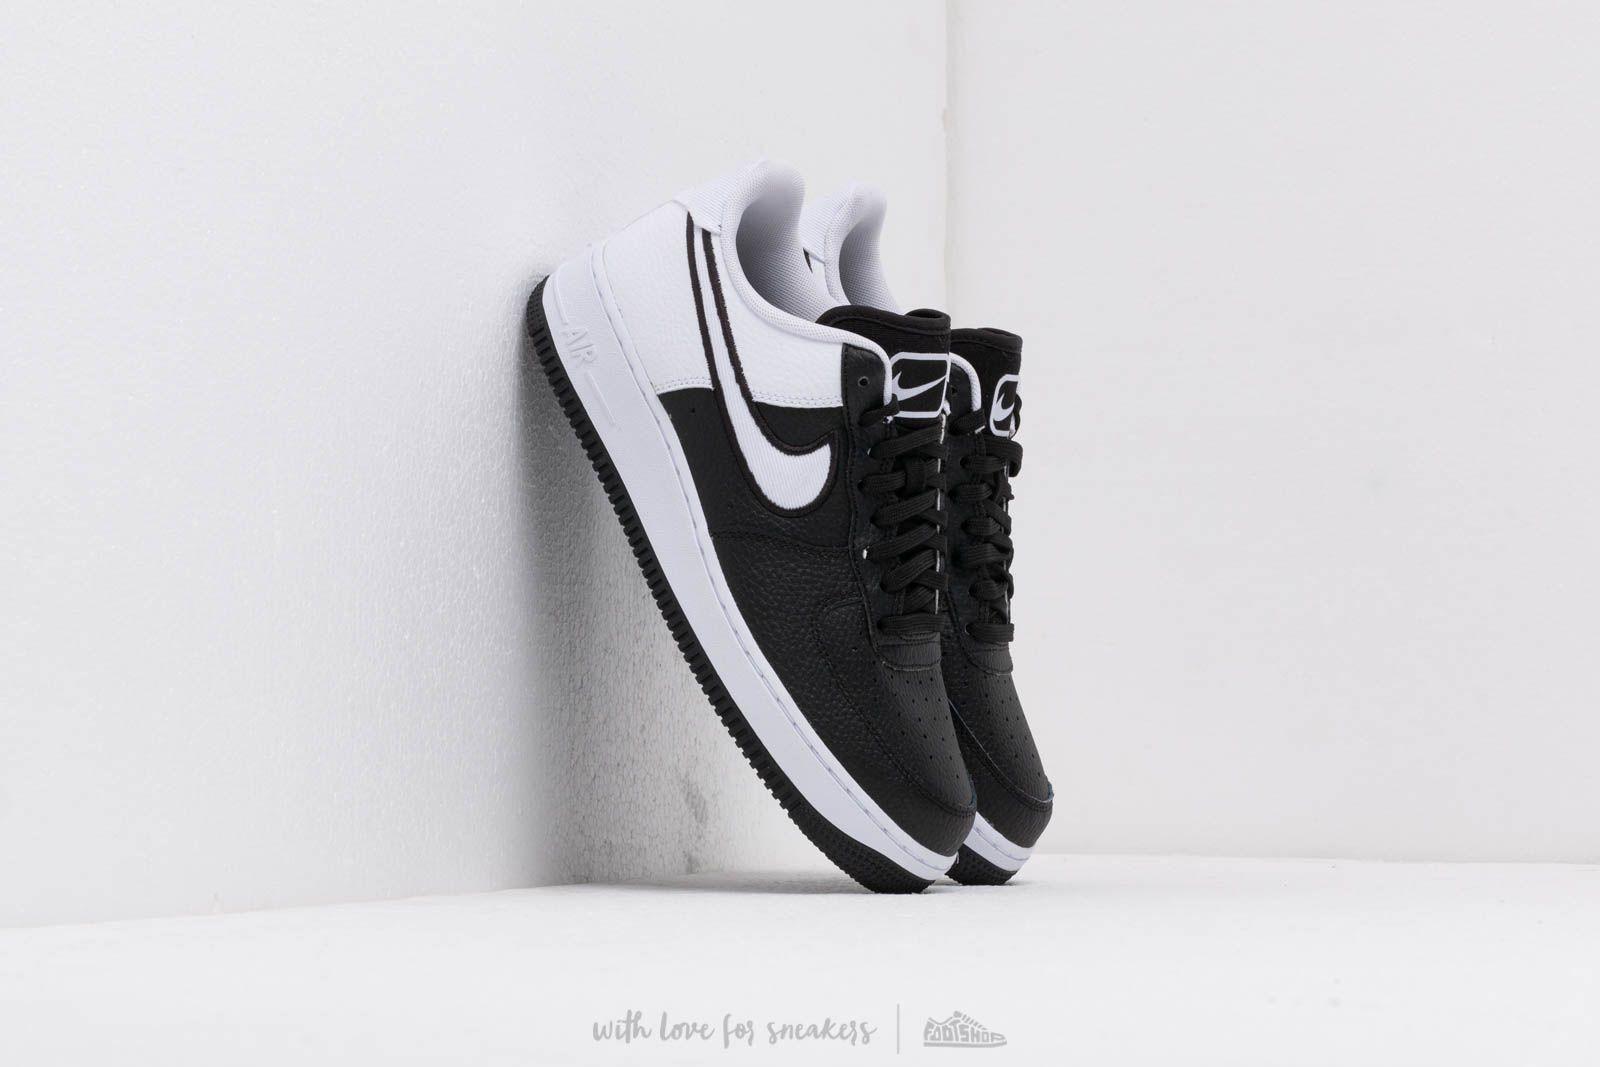 Nike Air Force 1 '07 Lv8 1 Black/ White